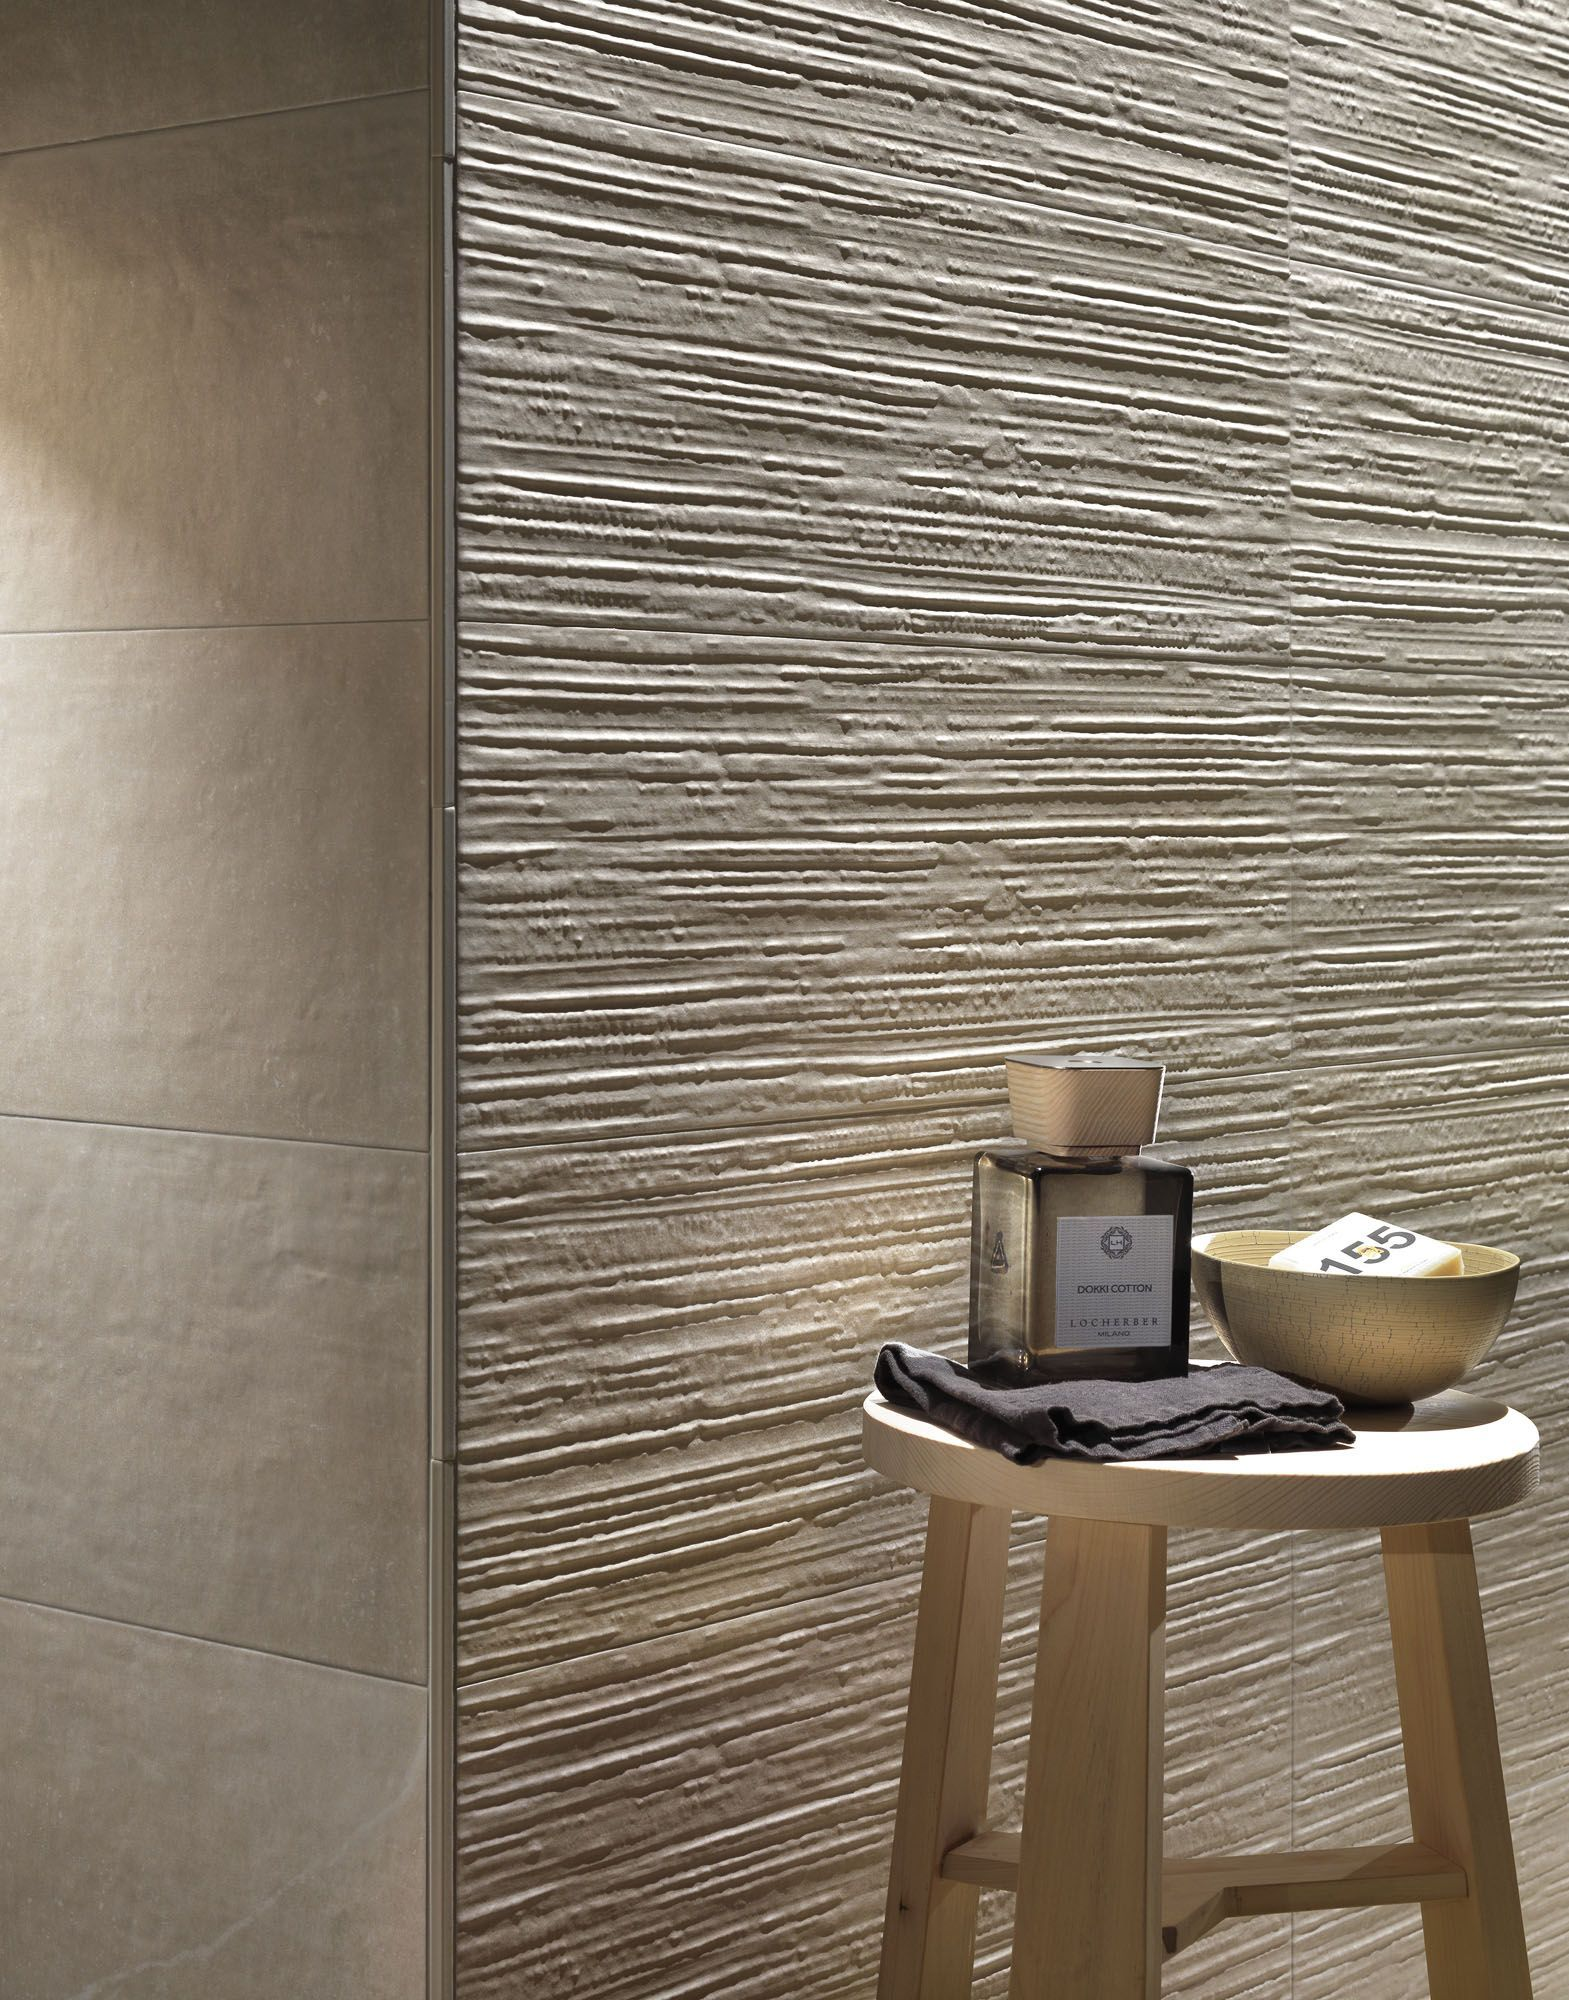 Maku Studio Effetto Maku In 2020 Wandbehandlung Strukturierte Wande Bartheken Design